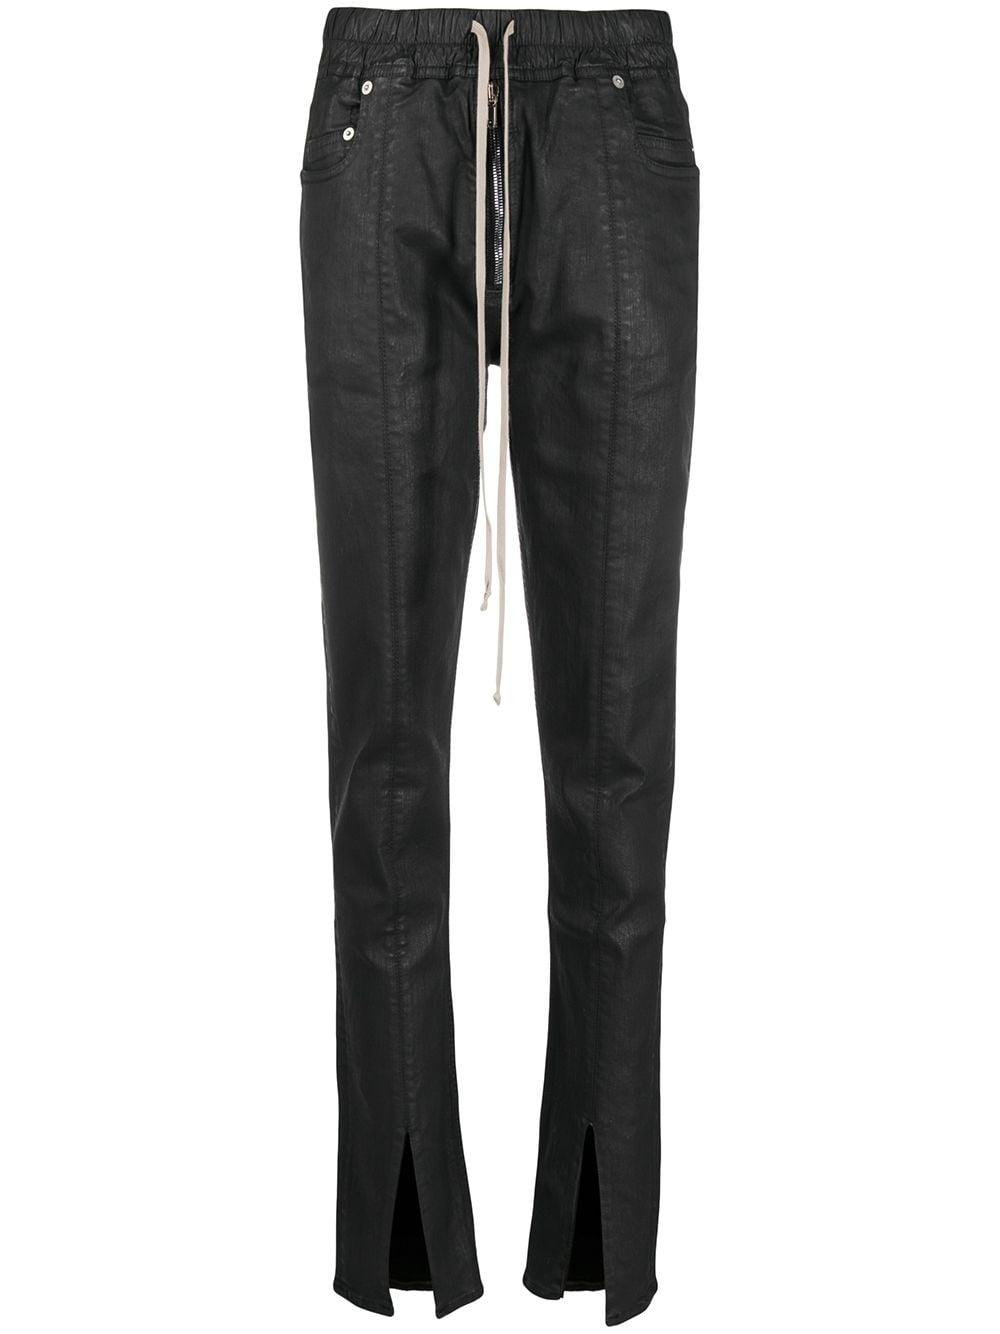 Slit Cut Denim Jeans